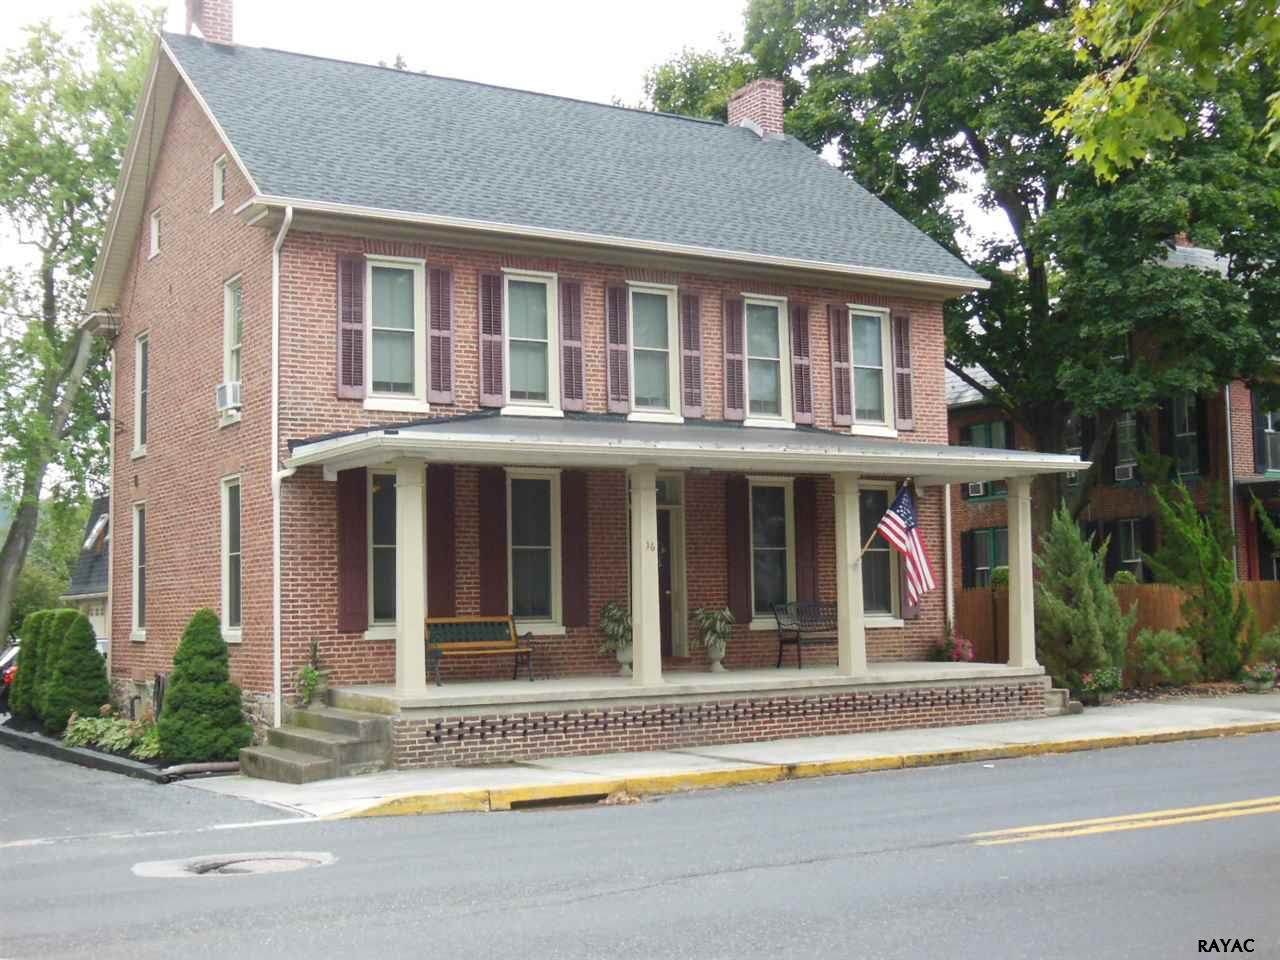 16 W Main St, Fairfield, PA 17320